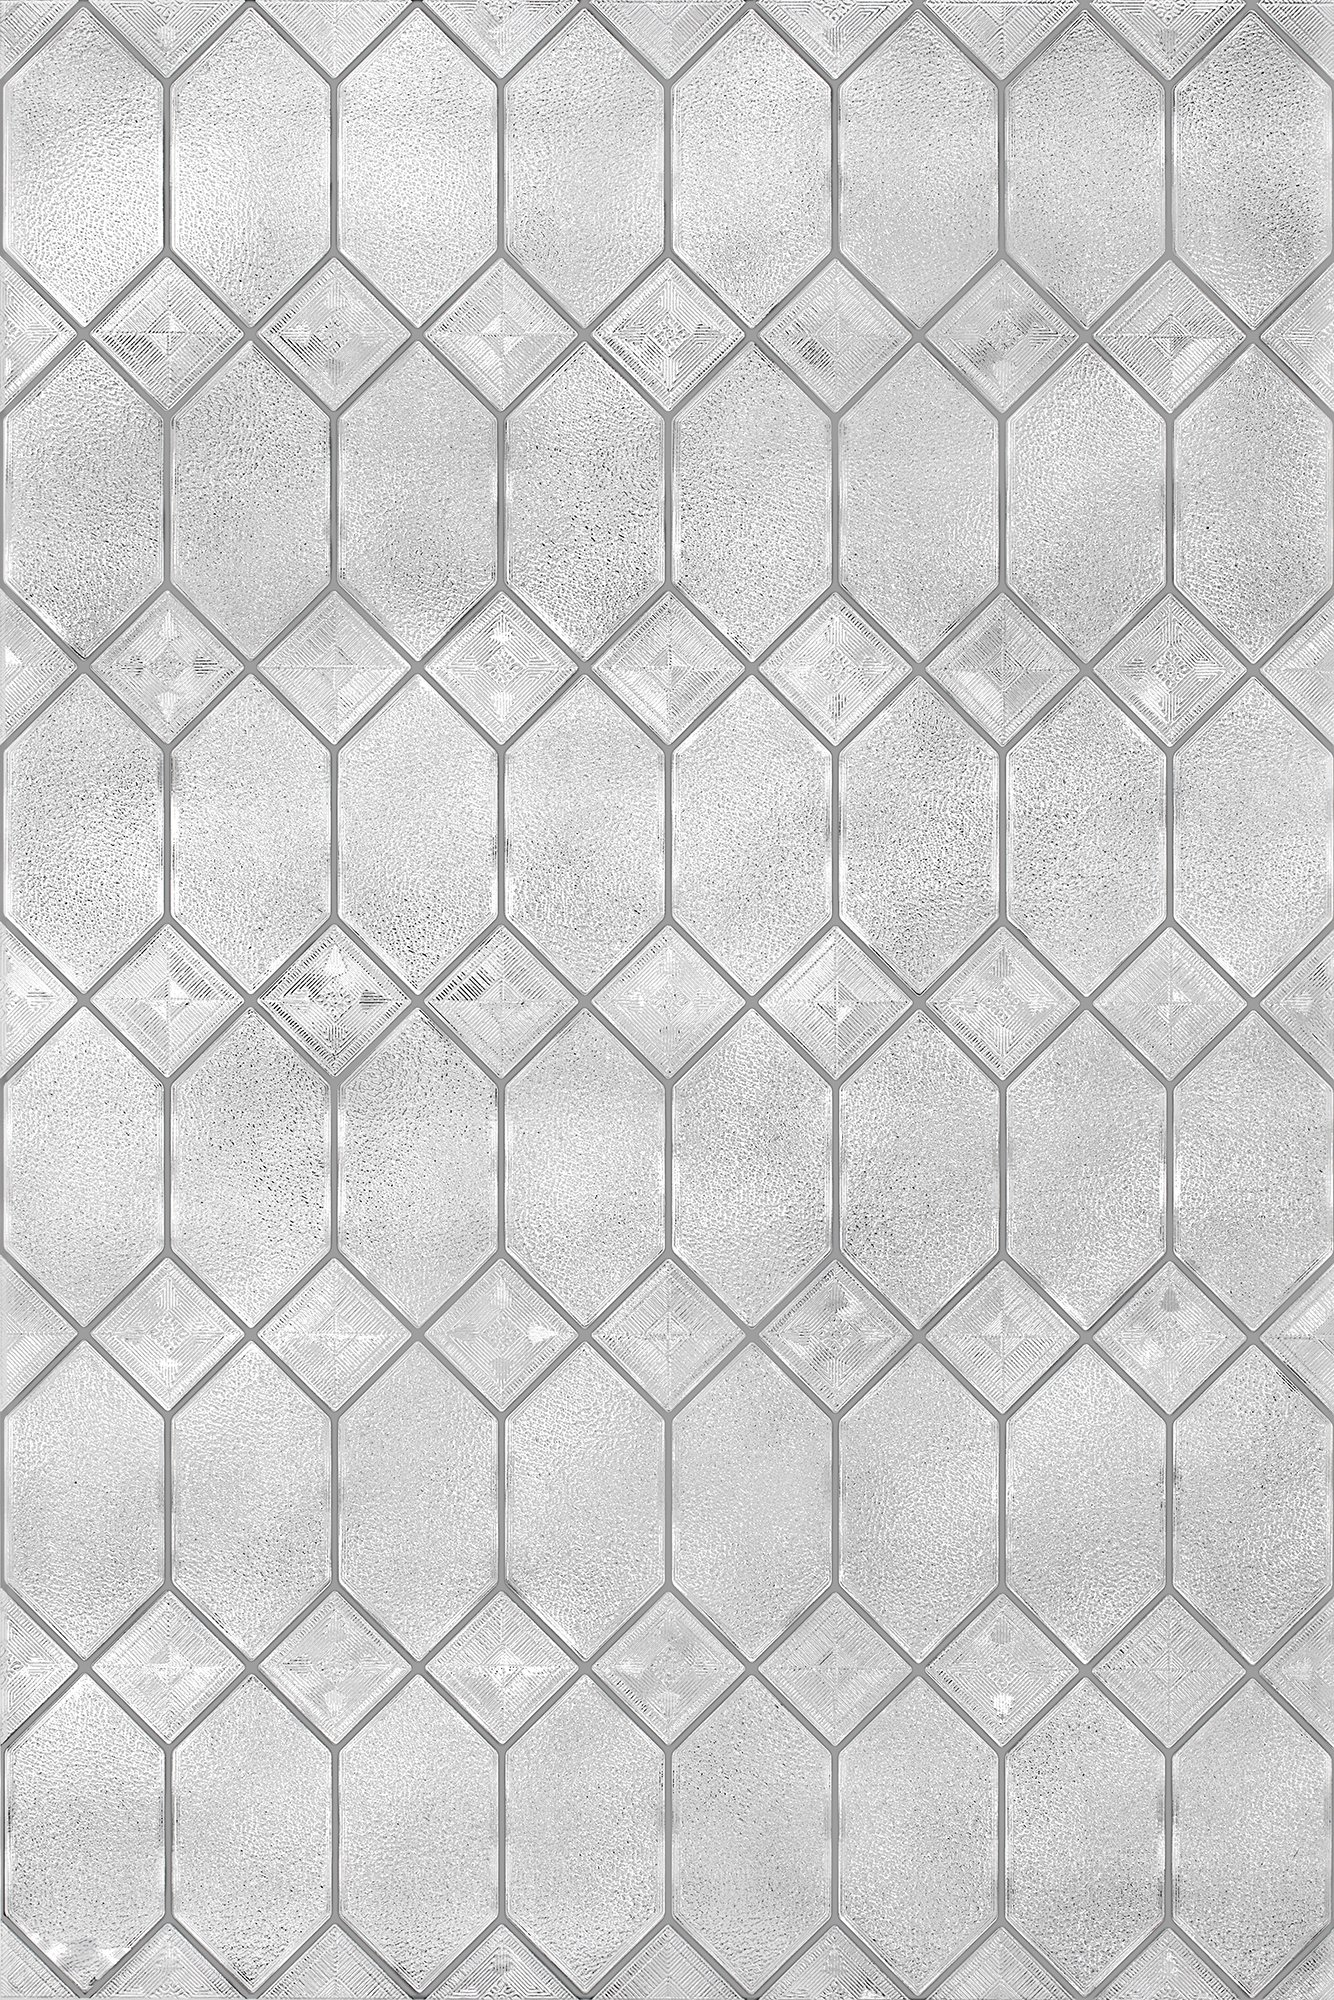 ARTSCAPE Old English Window Film 24'' x 36'' by ARTSCAPE (Image #4)